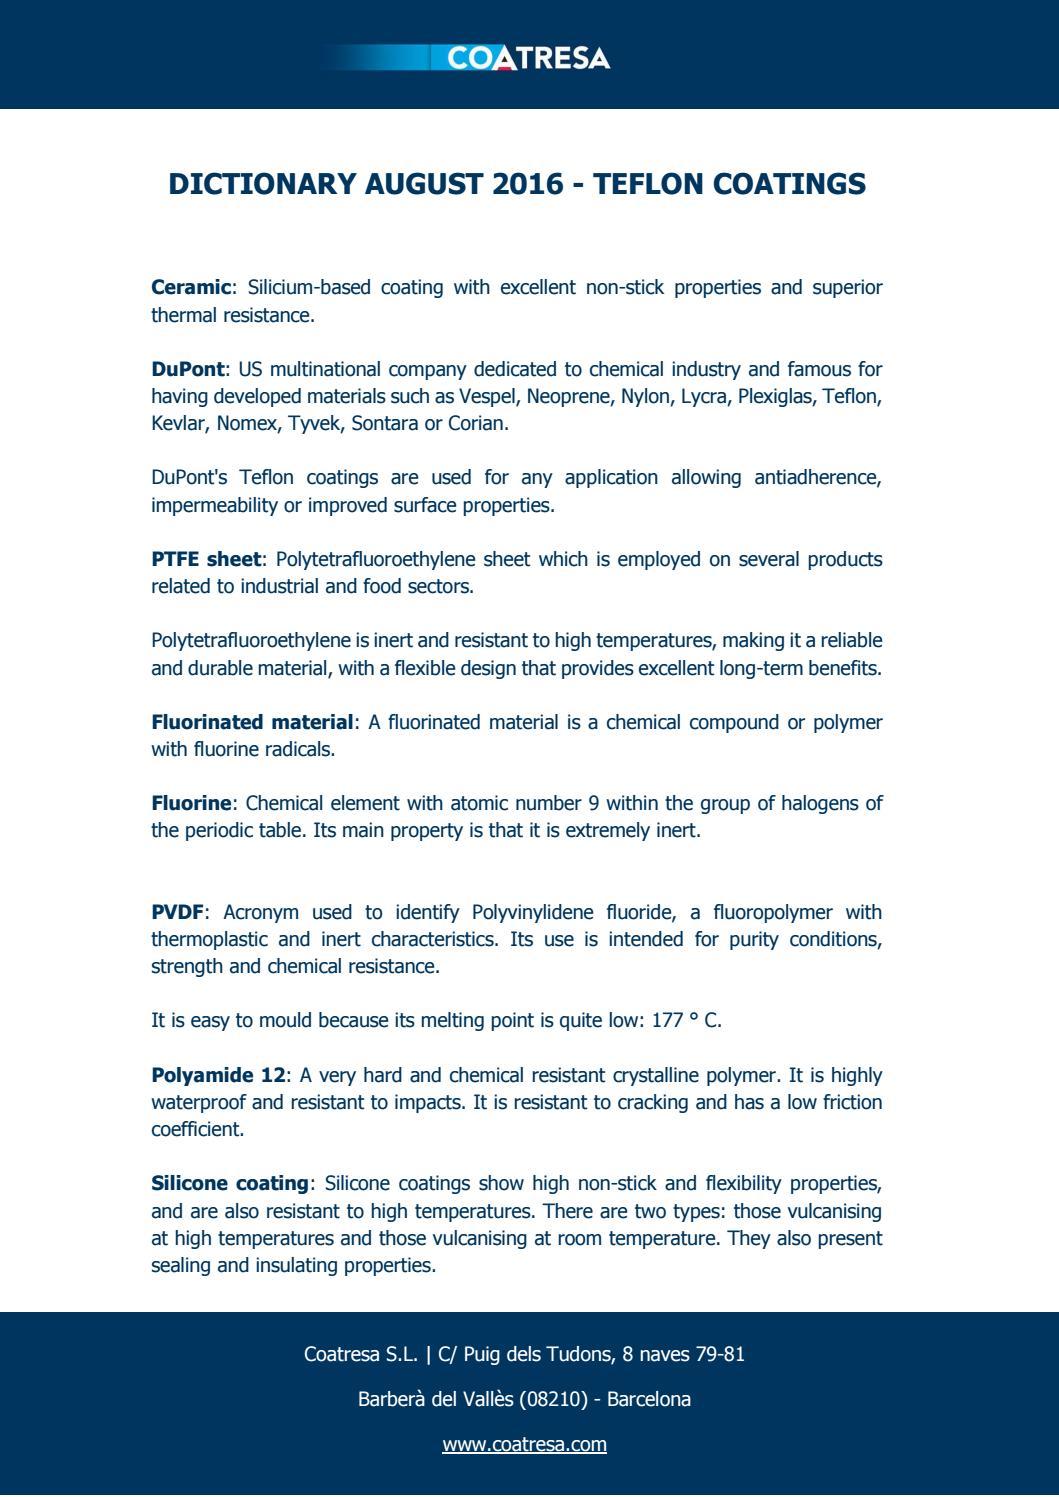 Dictionary August 2016 - Teflon Coatings by Coatresa - issuu